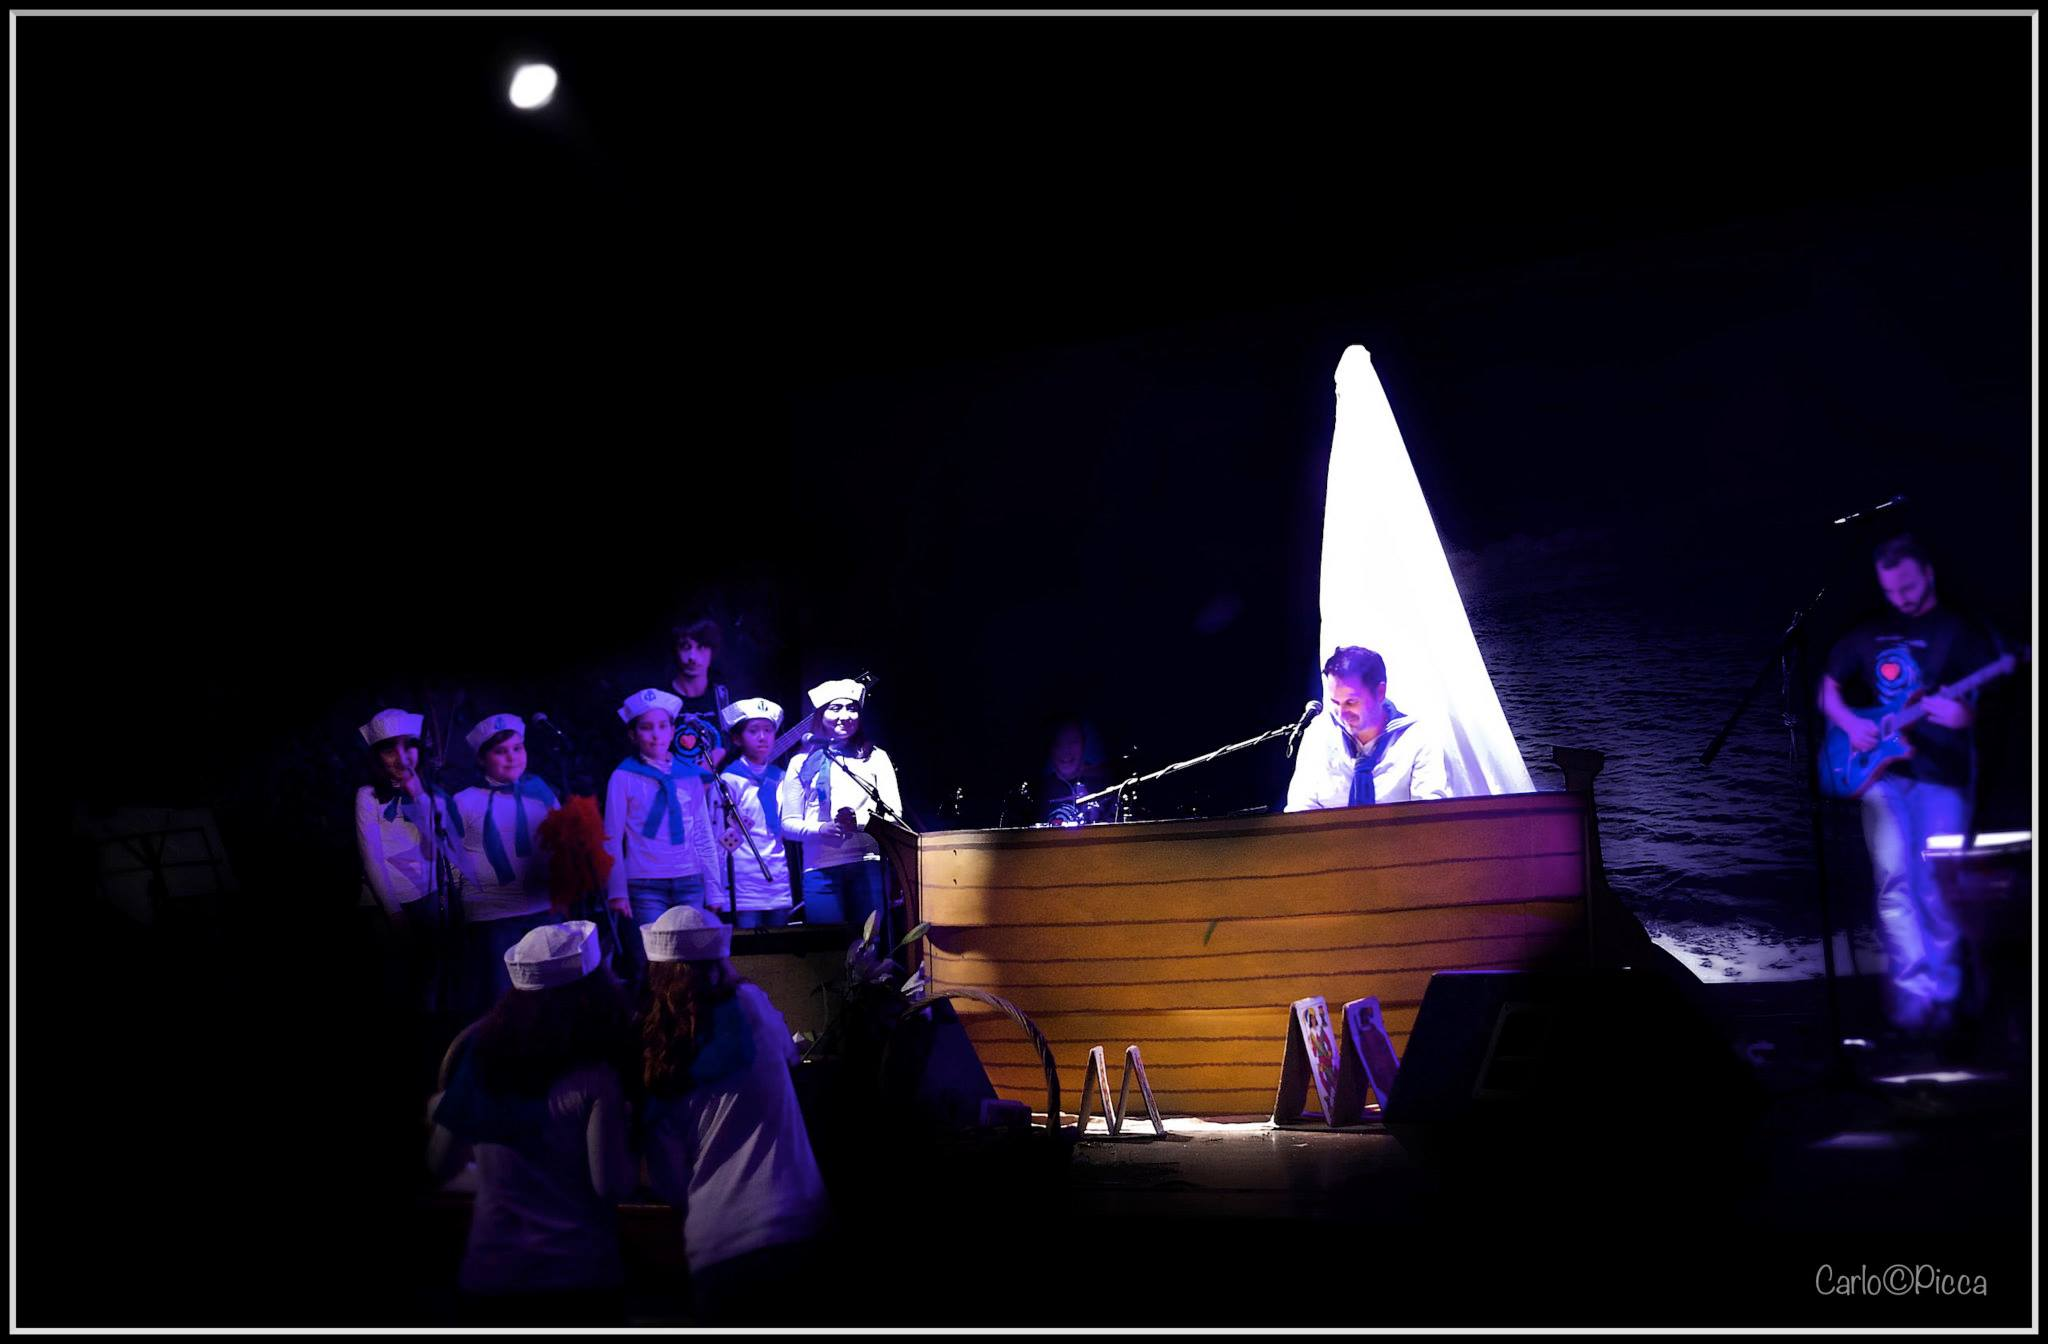 Opeliu Teatro Aurora